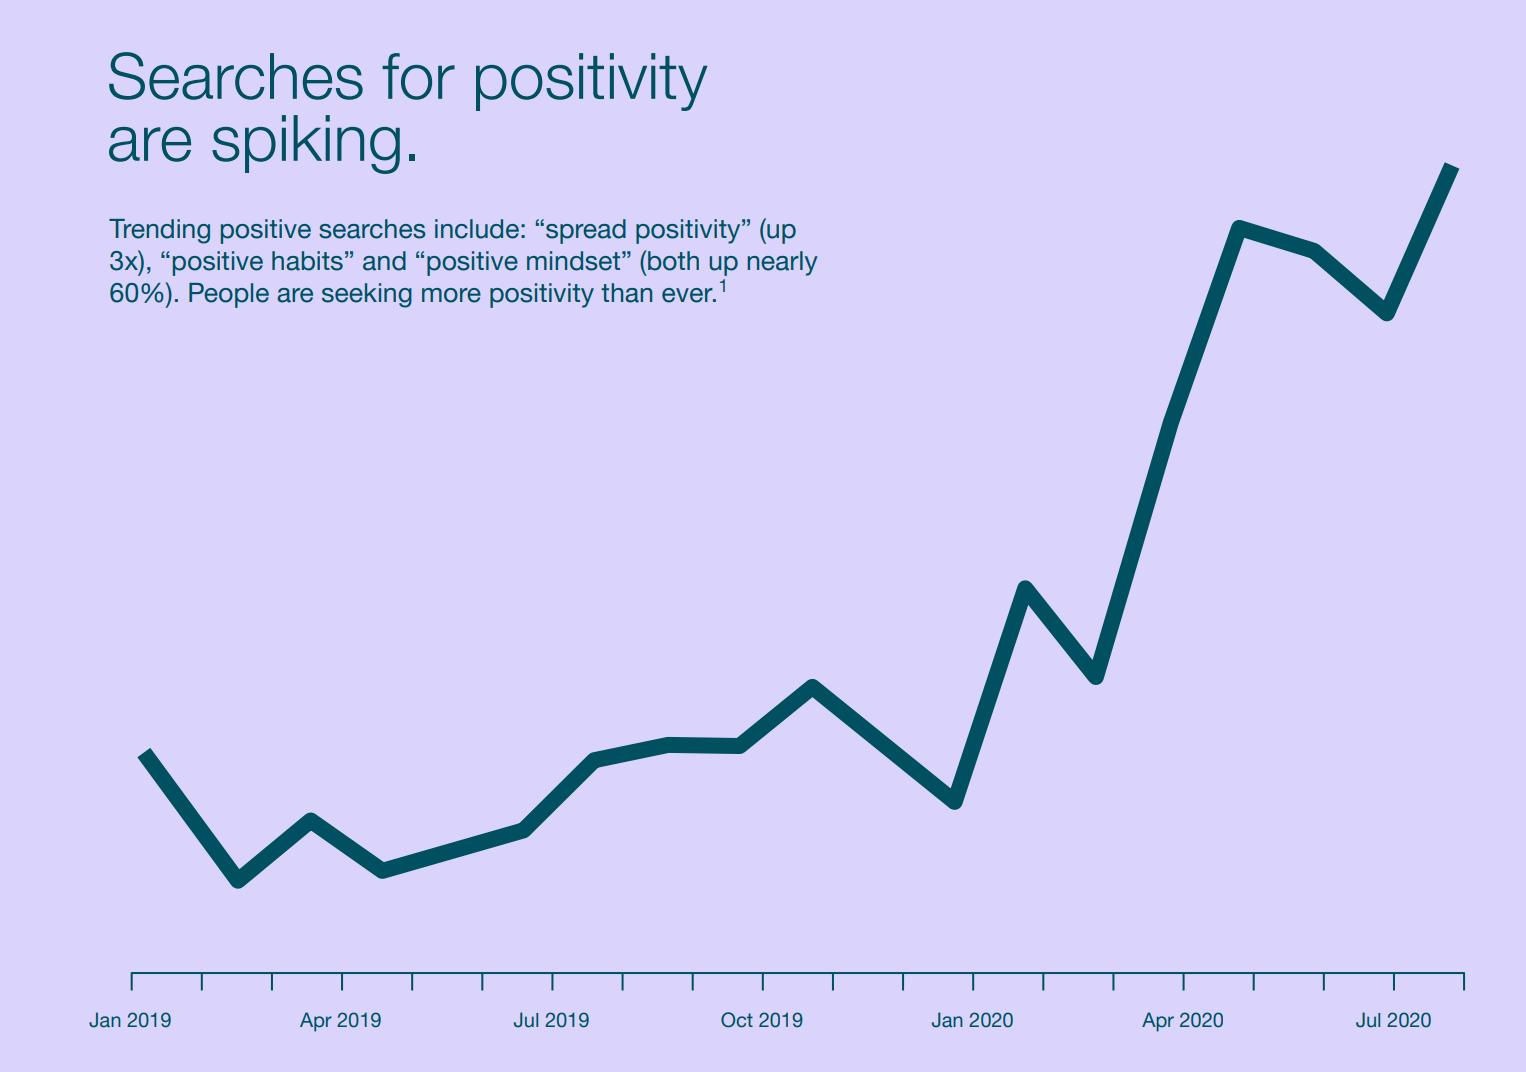 Pinterest positivity searches graph